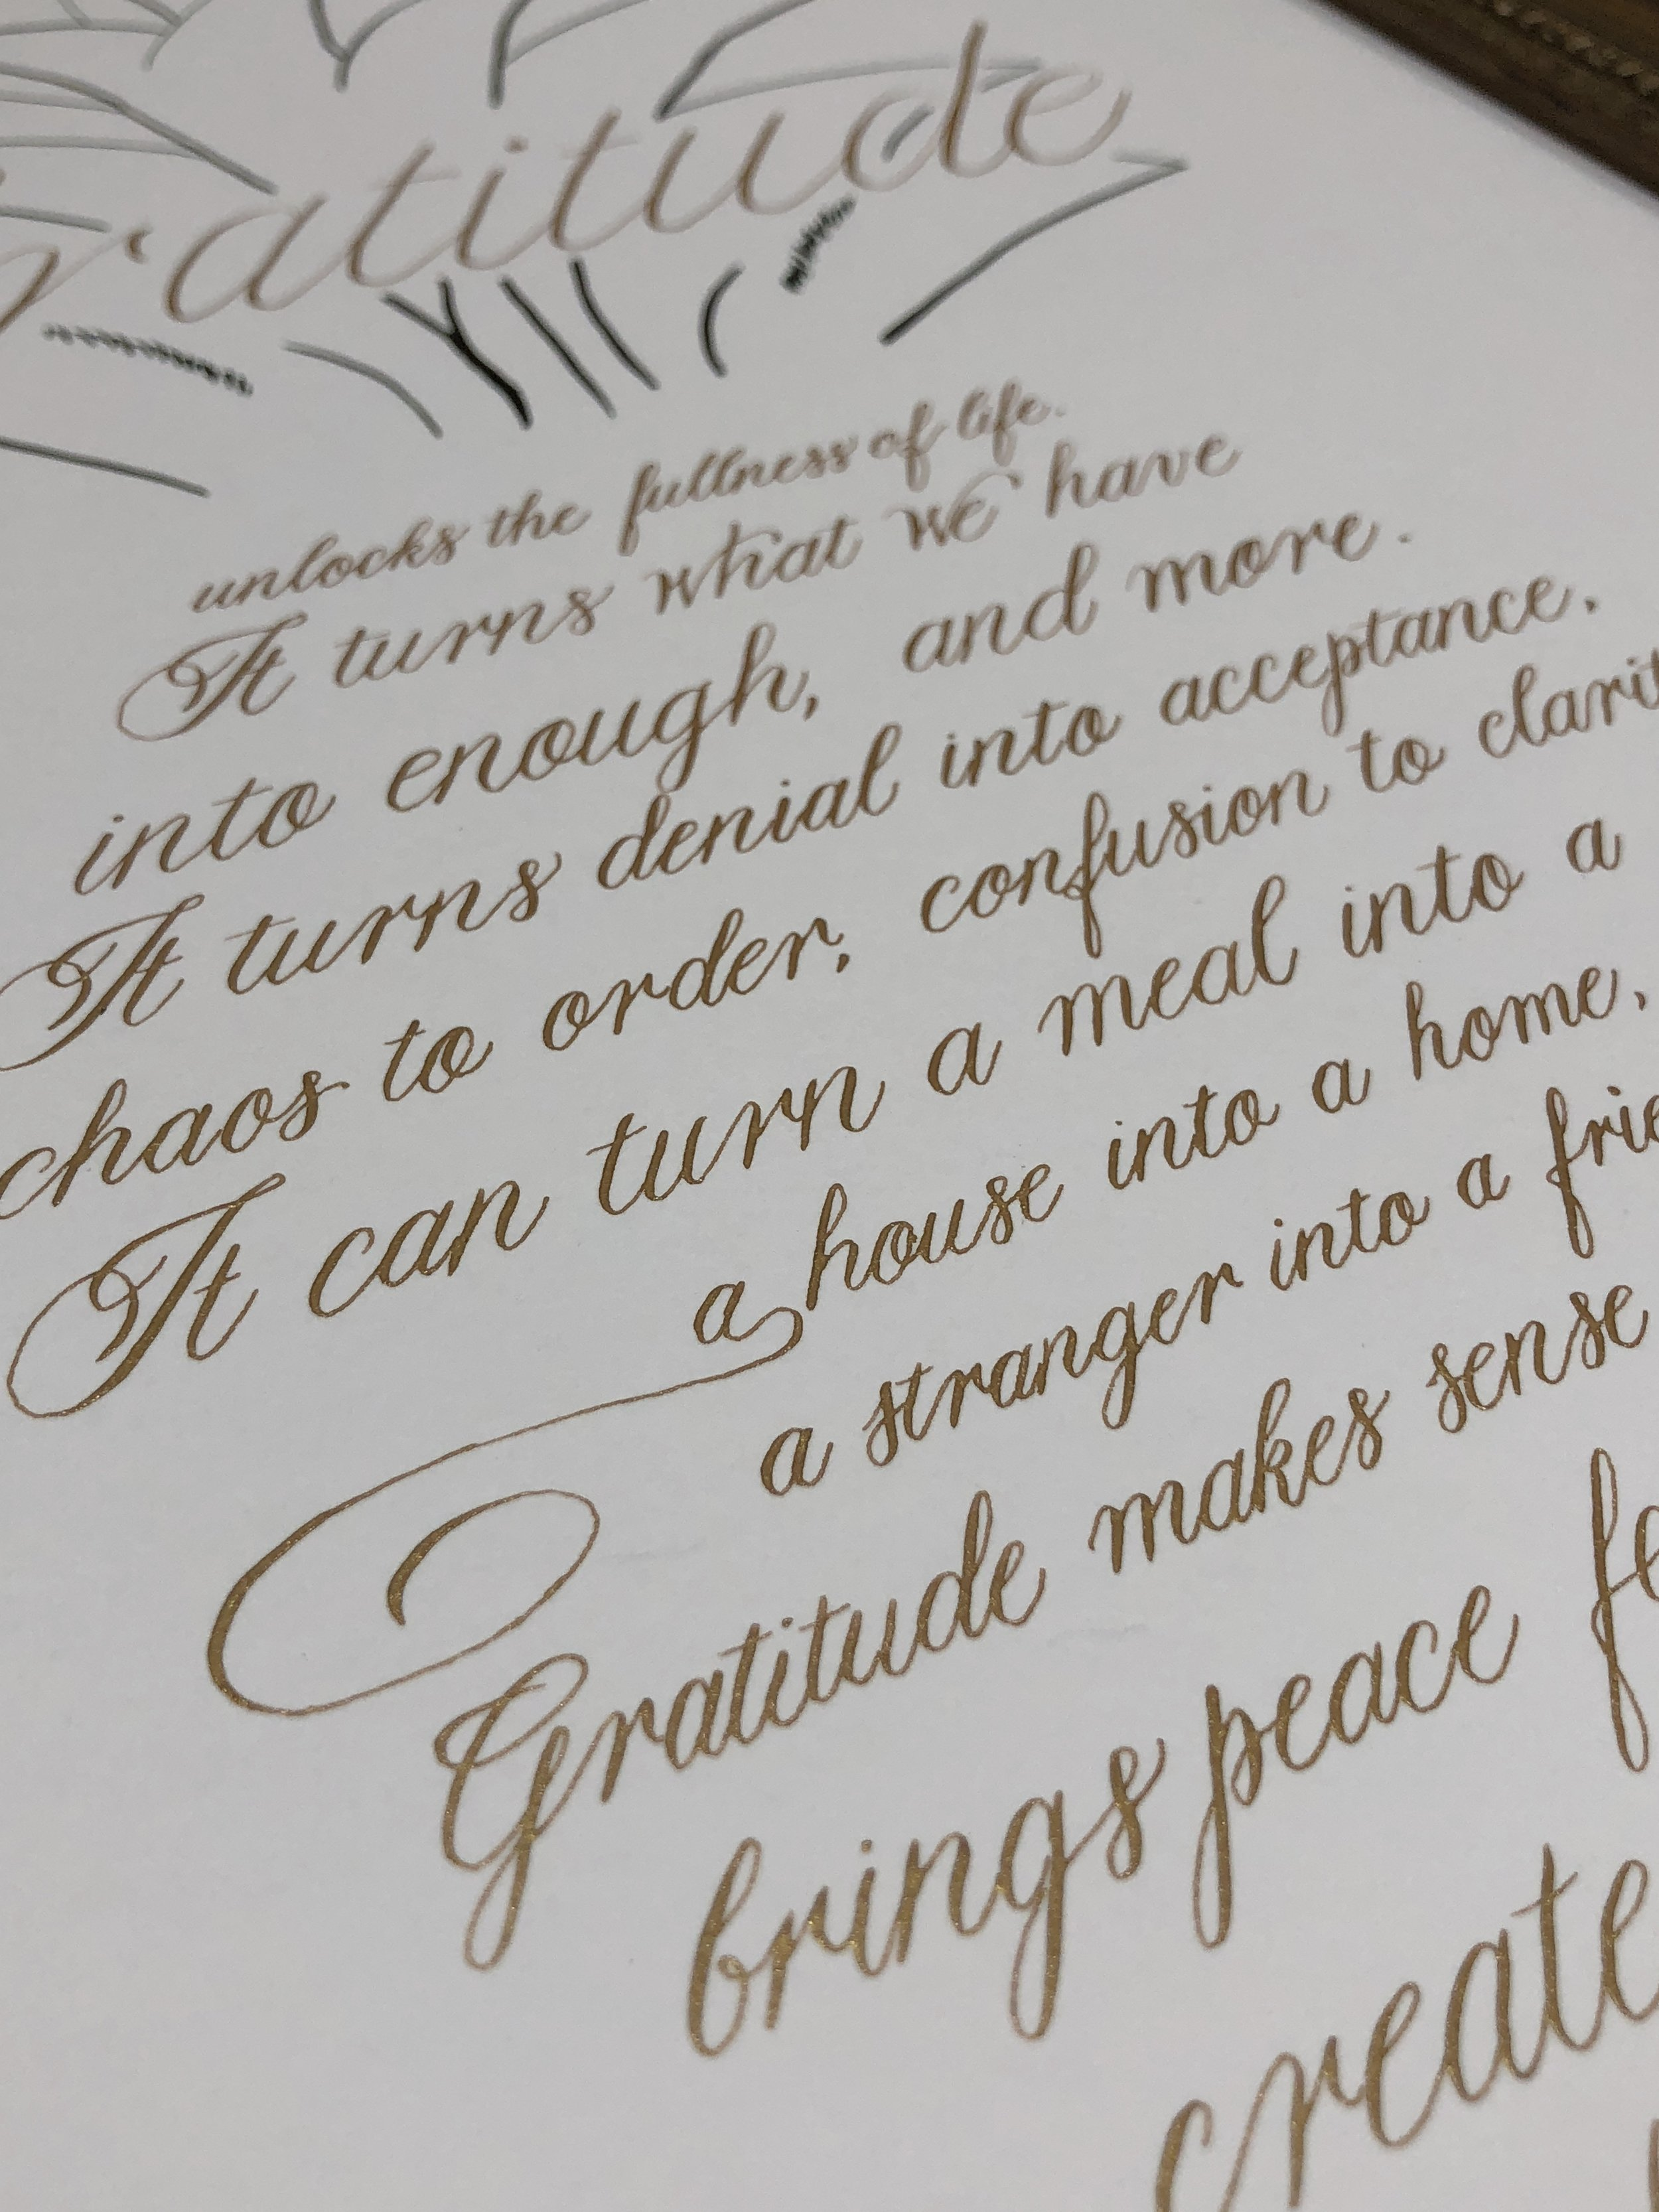 Central PA, York PA, JesSmith Designs, custom, wedding, invitations, bridal, announcements, save the date, baby, hanover, calligraphy, baltimore, wedding invitations, lancaster, gettysburg-12-20 05.30.41.jpg